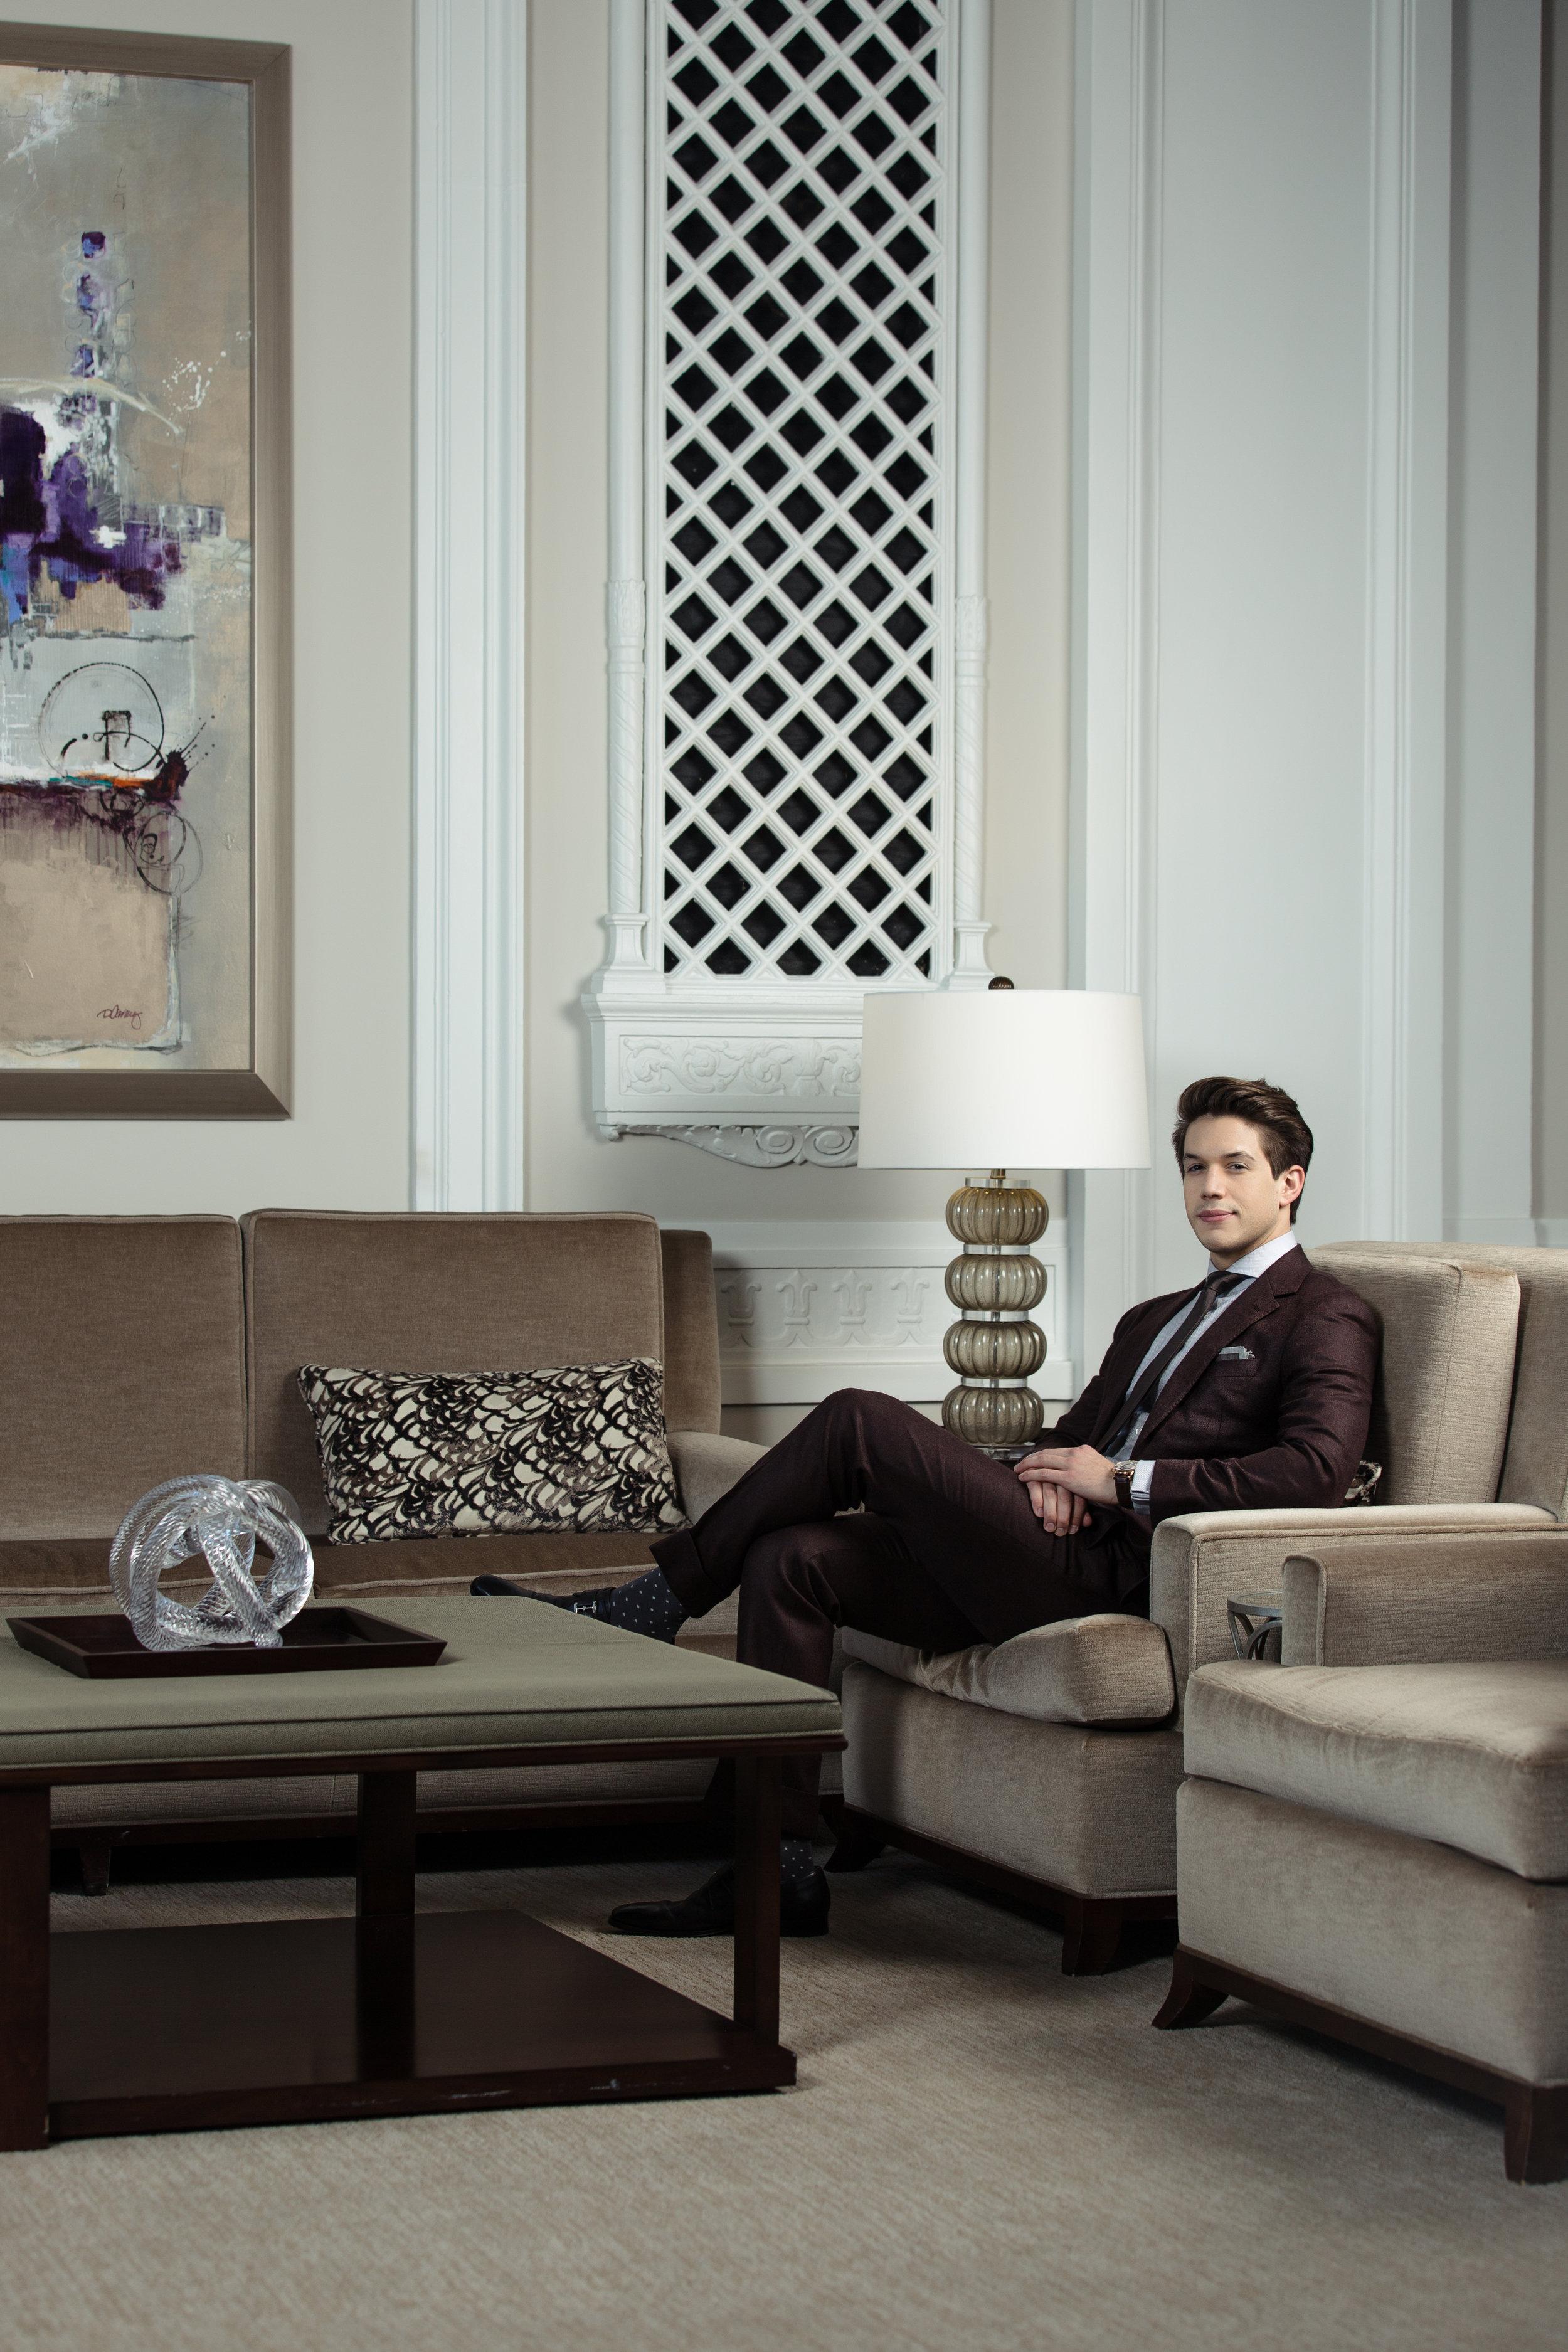 Daniel George bespoke suit